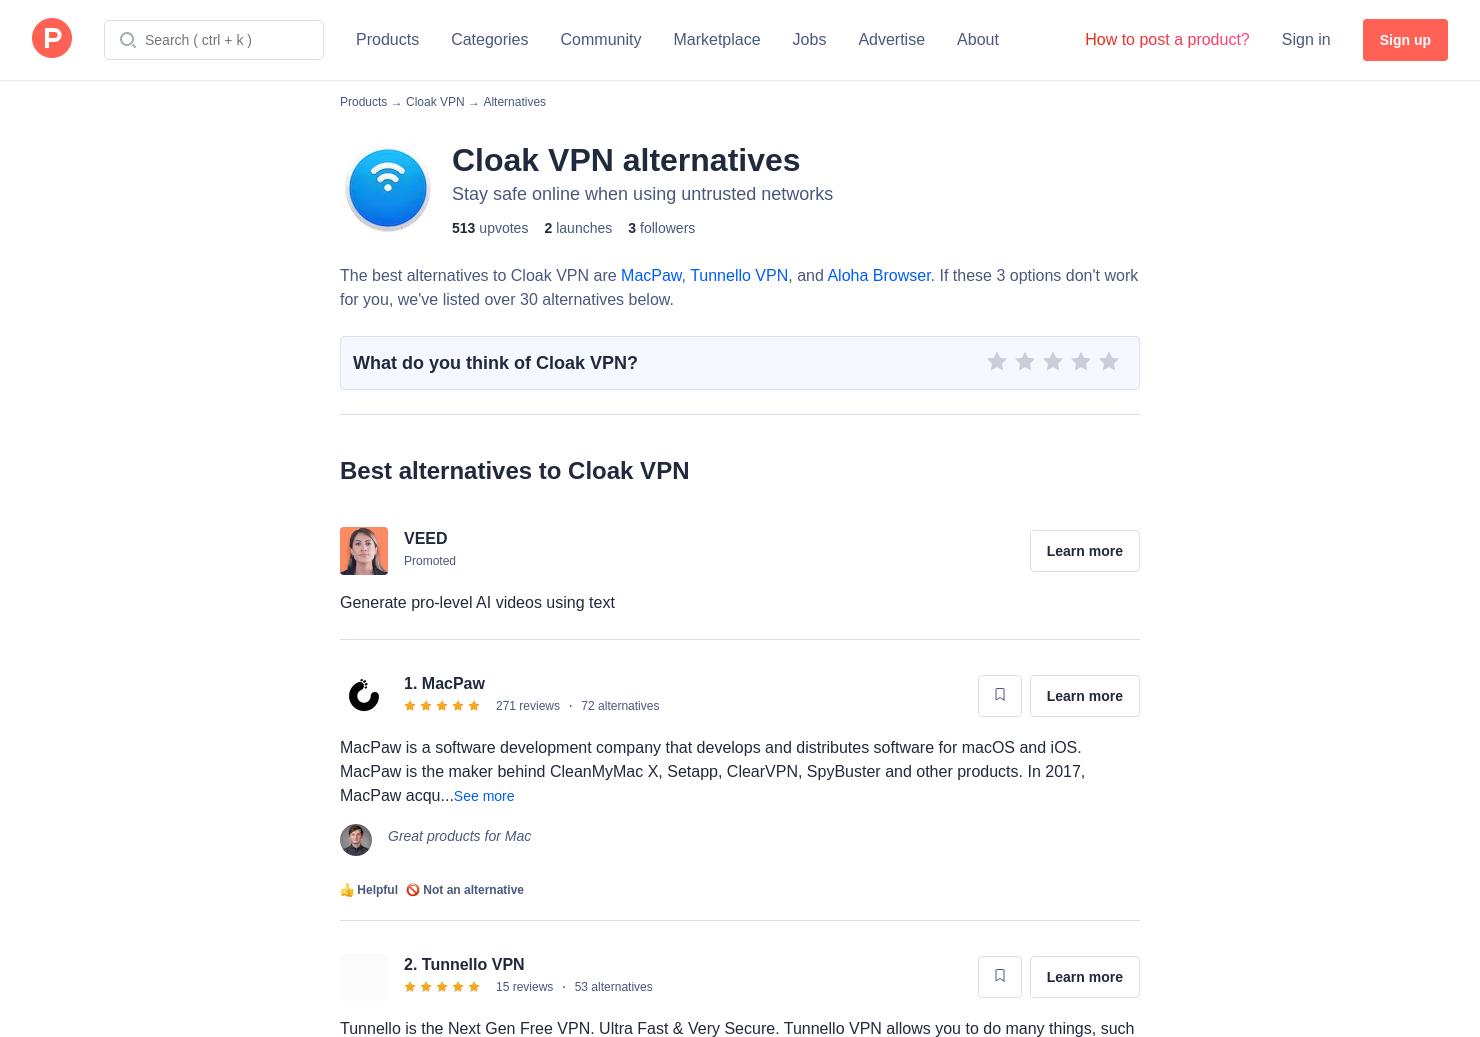 24 Alternatives to Cloak VPN   Product Hunt